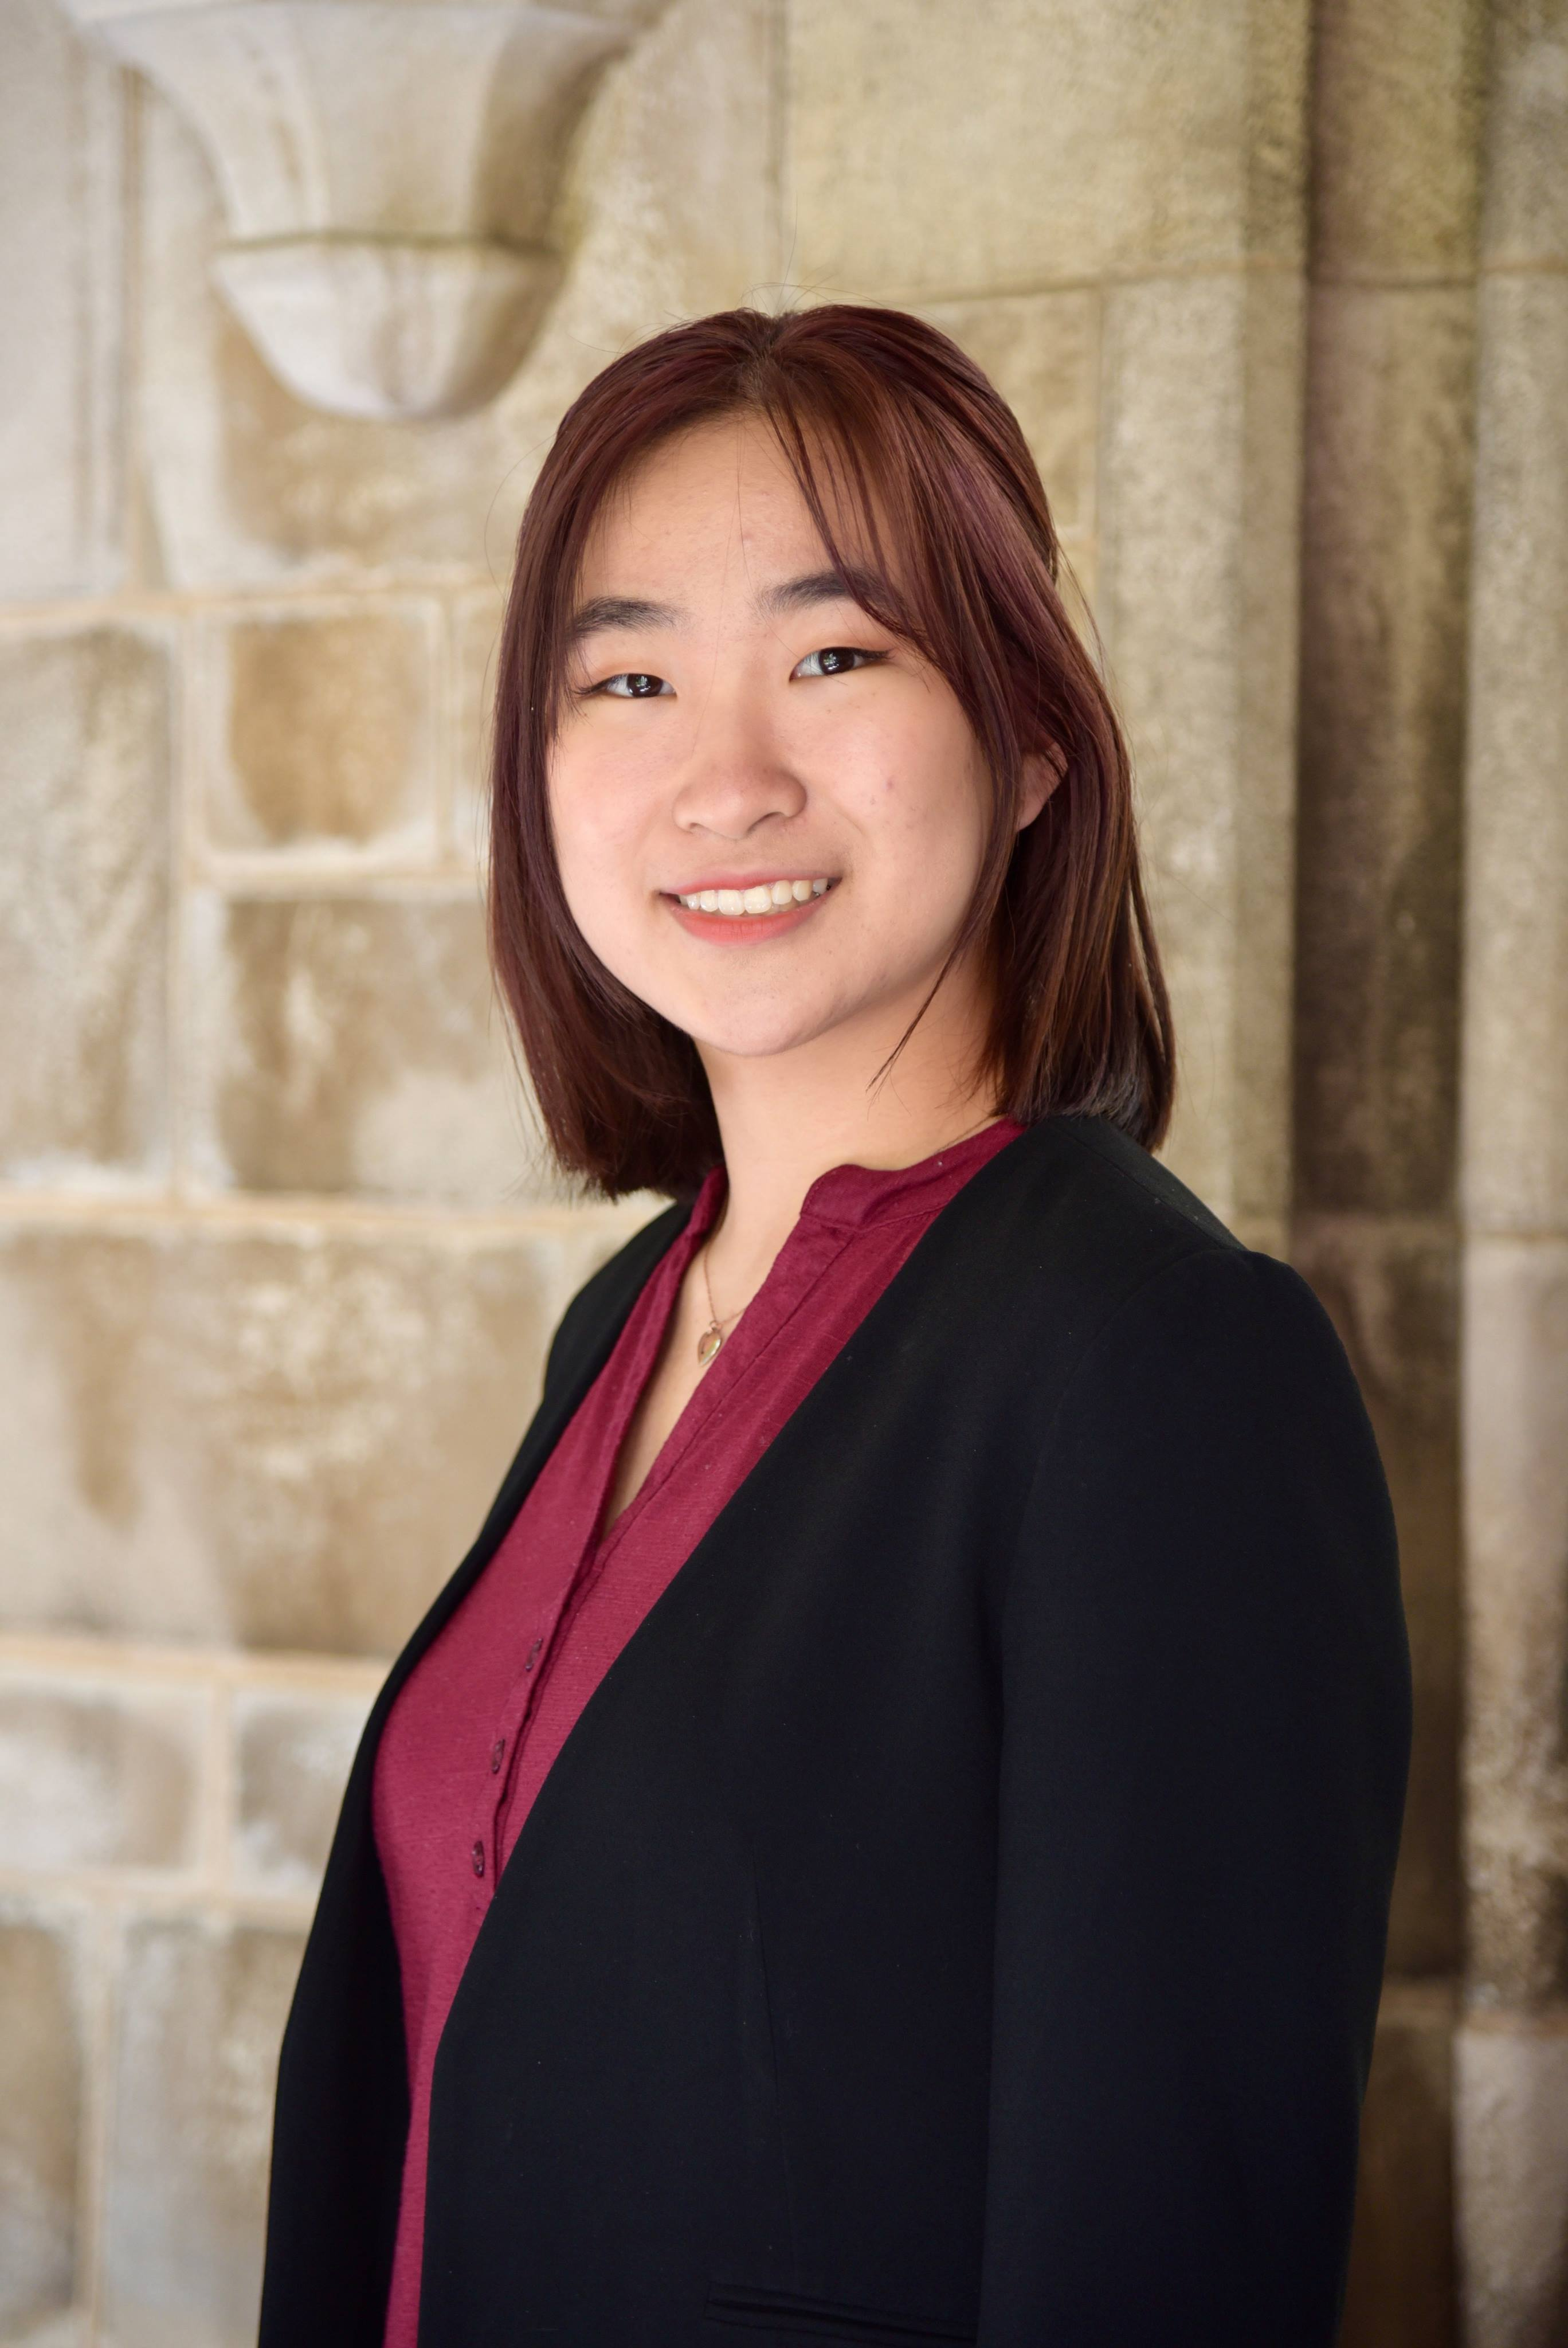 Ms. Laura Liu (she/her)